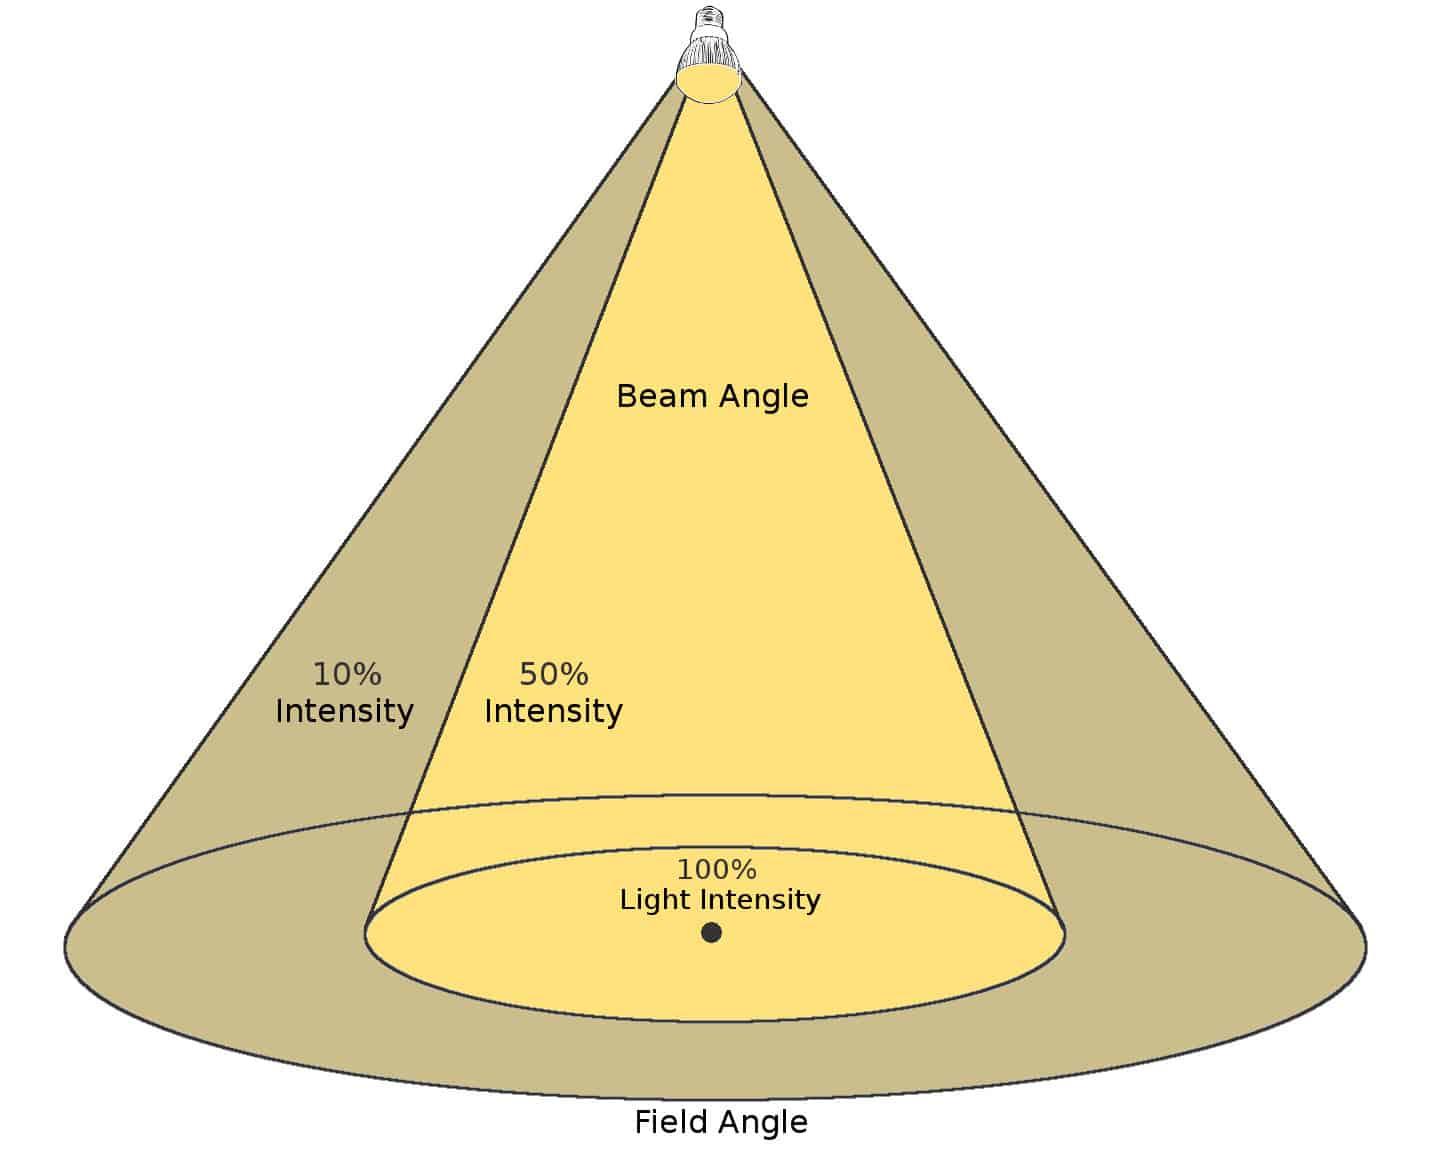 Different light intesity in beam angle vs field angle